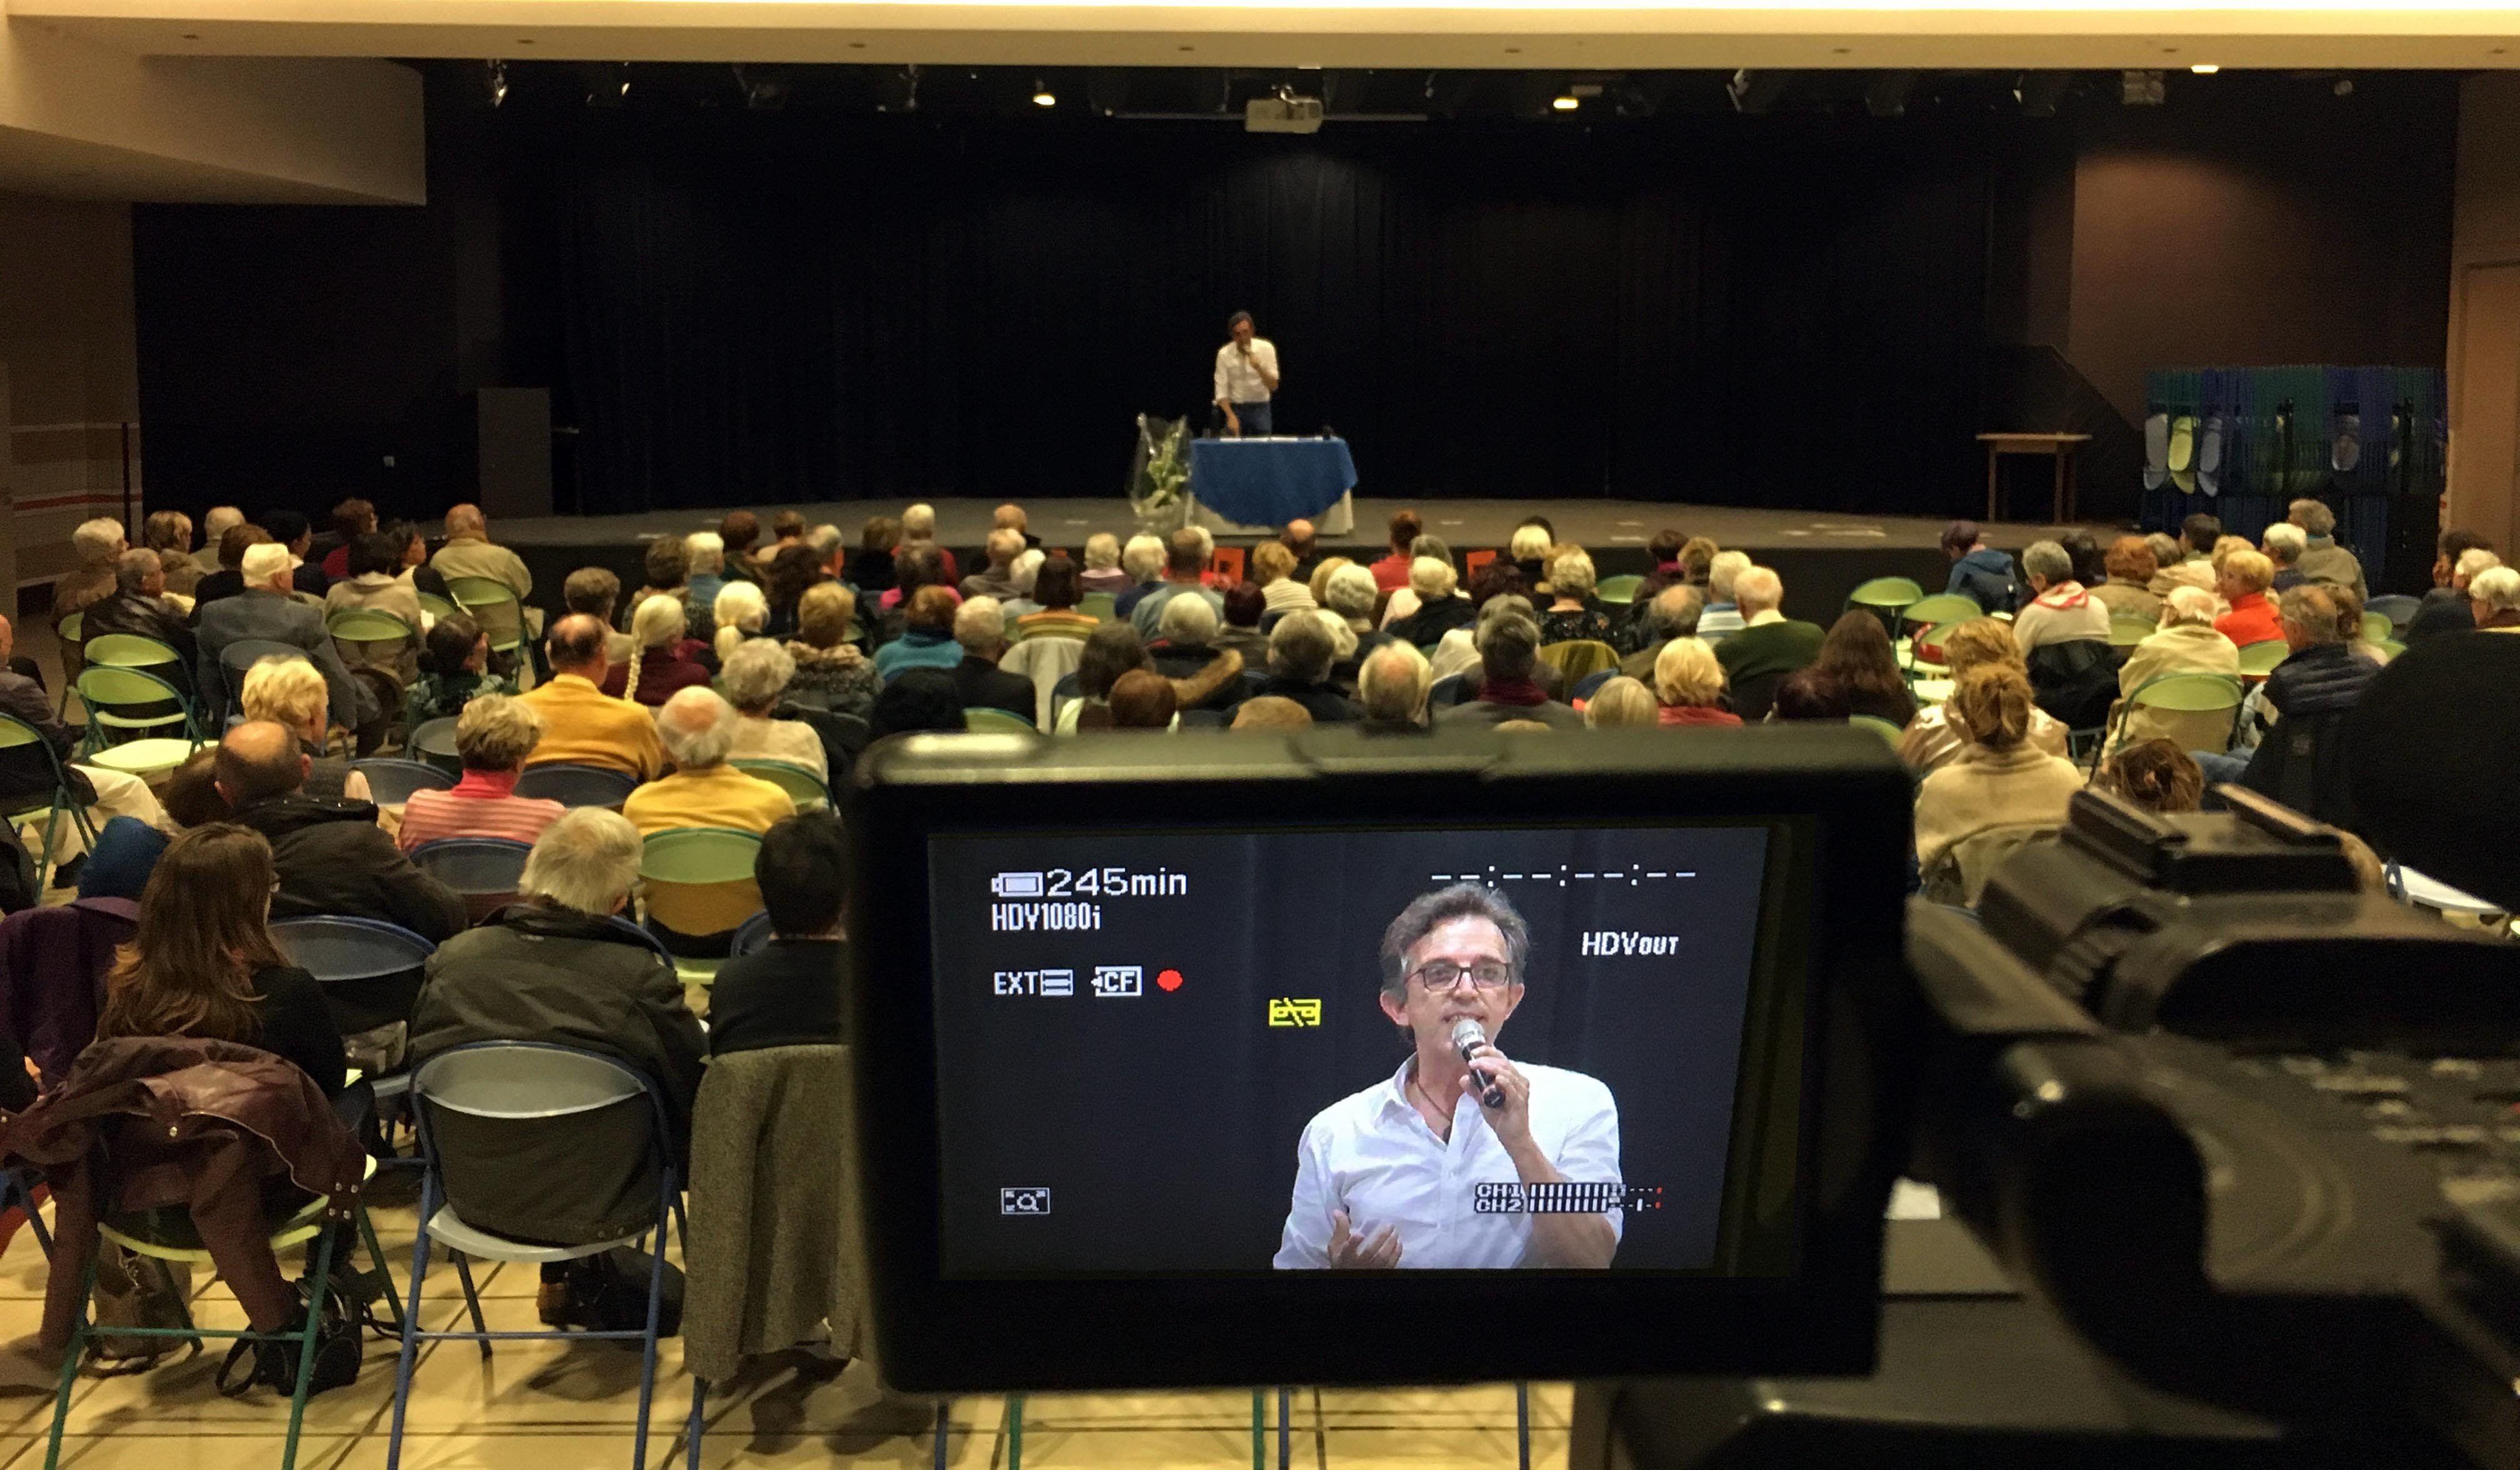 Jean Pélissier  Vieillir en bonne santé et prévenir Alzheimer